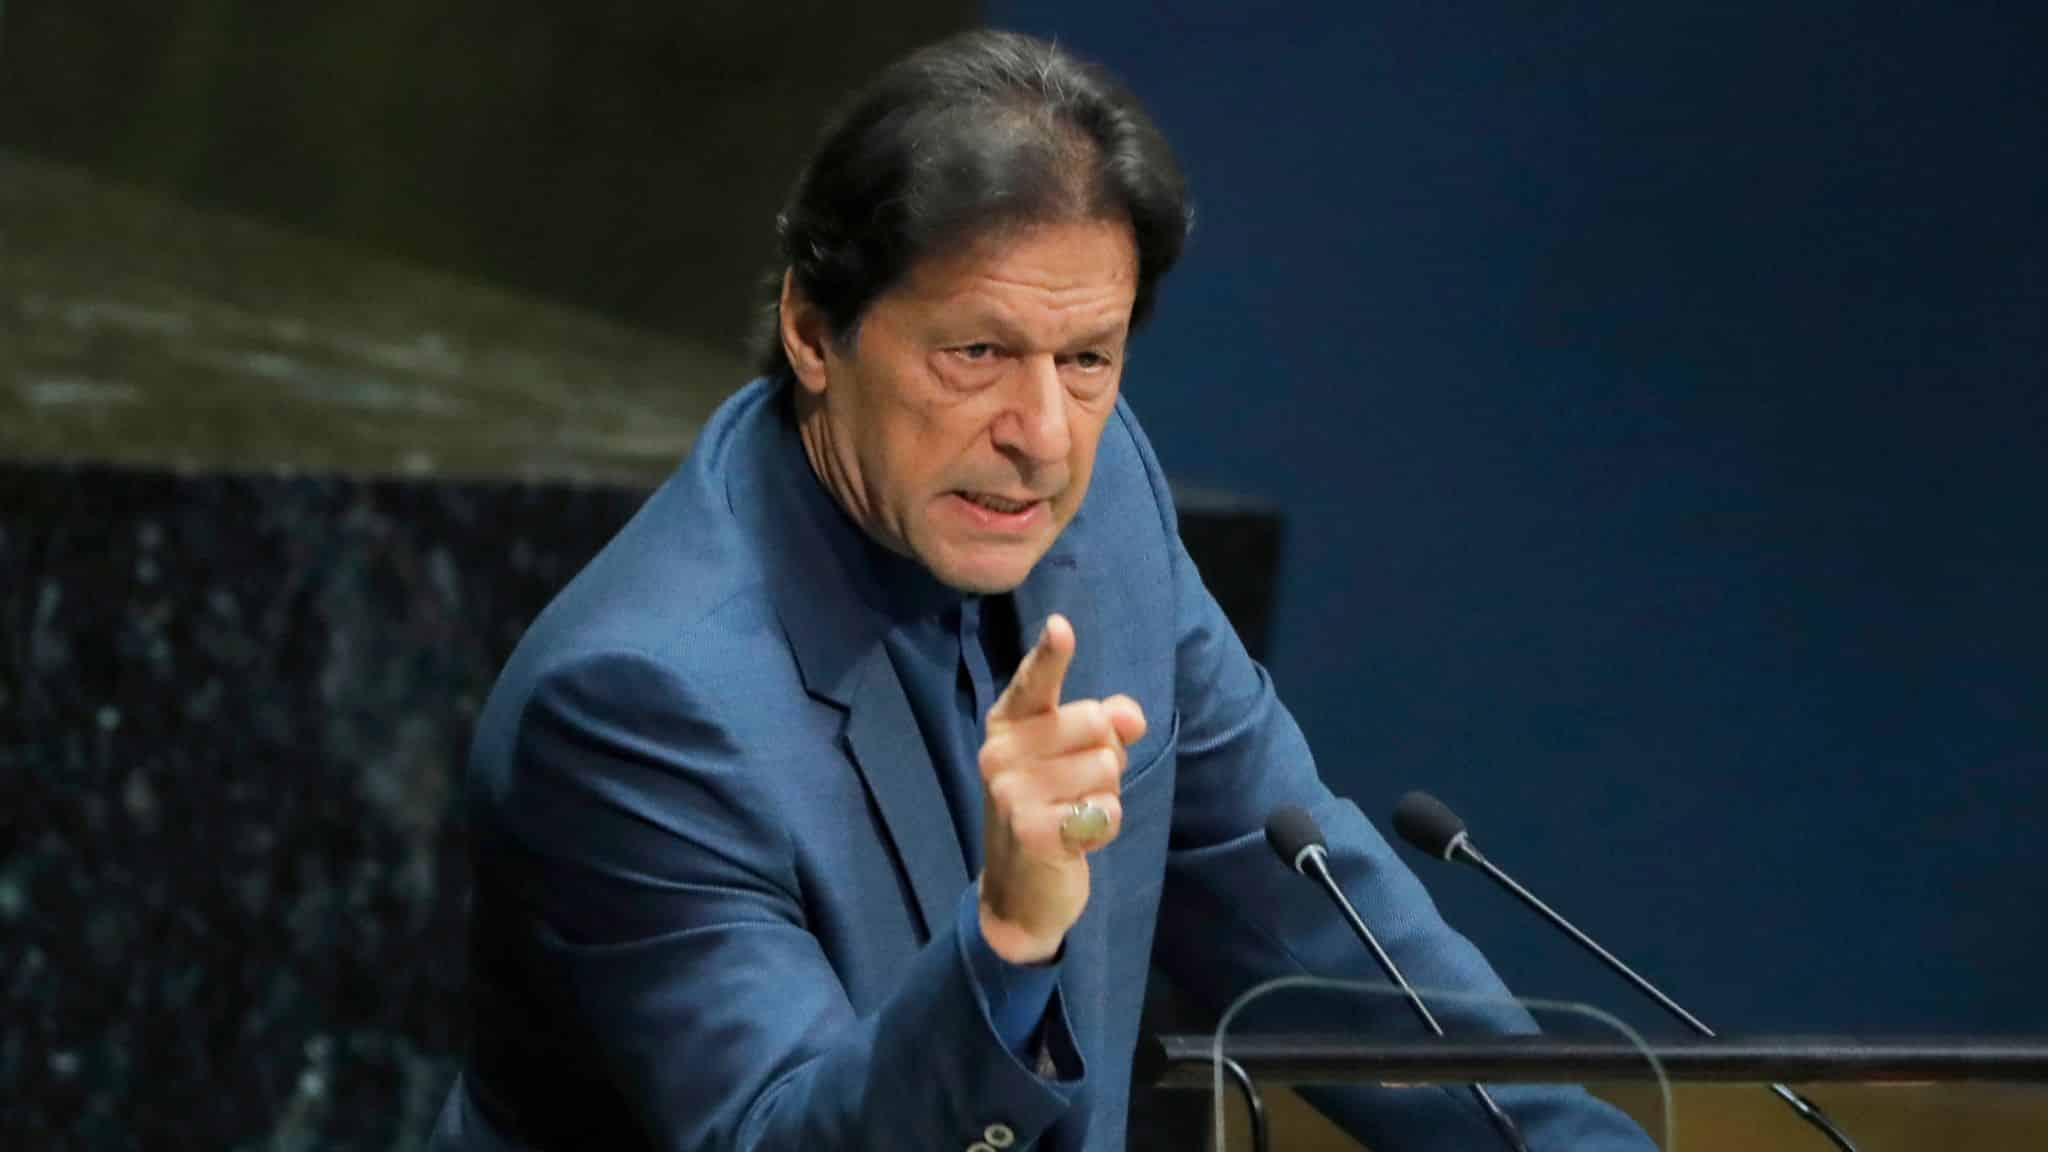 Imran Khan laments lack of long-term planning in Pakistan